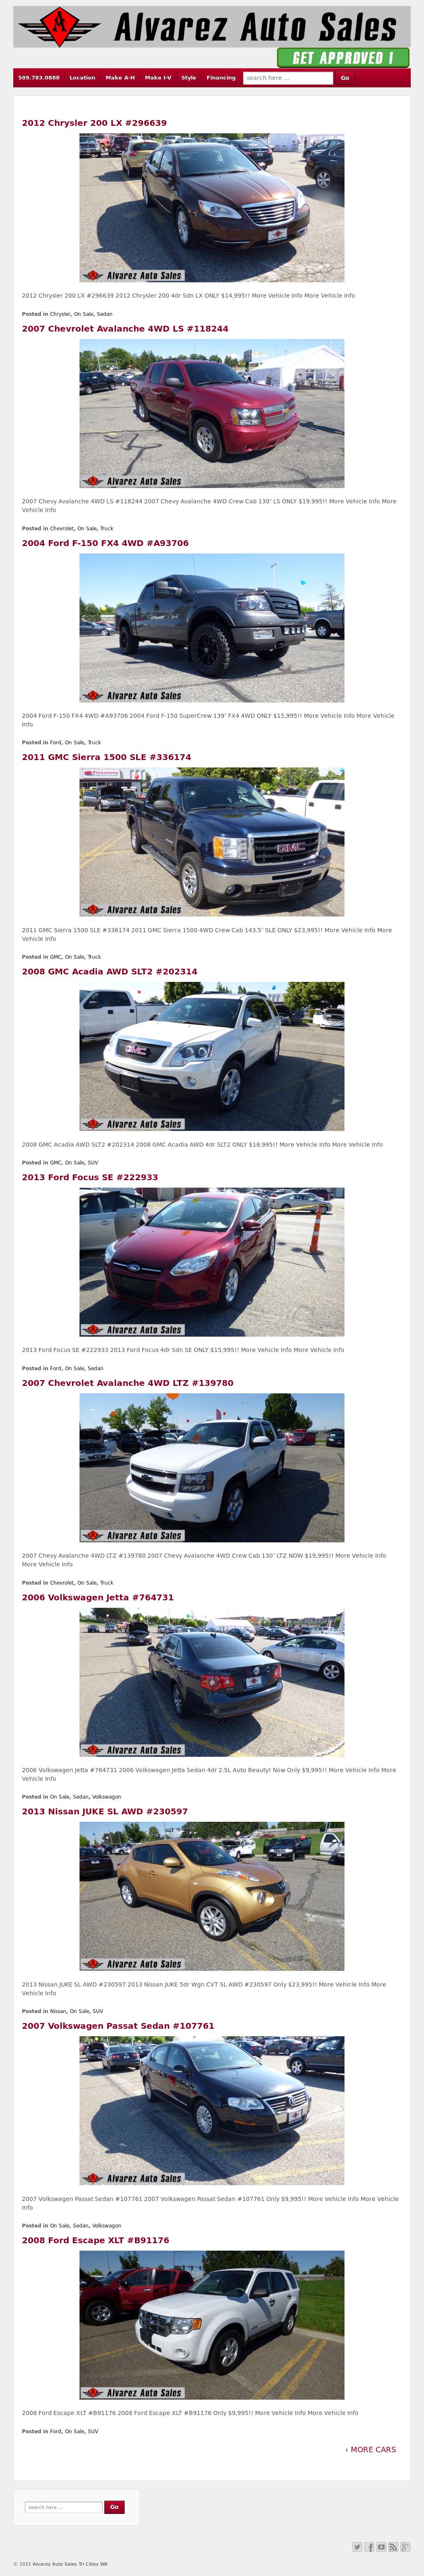 Alvarez Auto Sales >> Alvarez Auto Sales Competitors Revenue And Employees